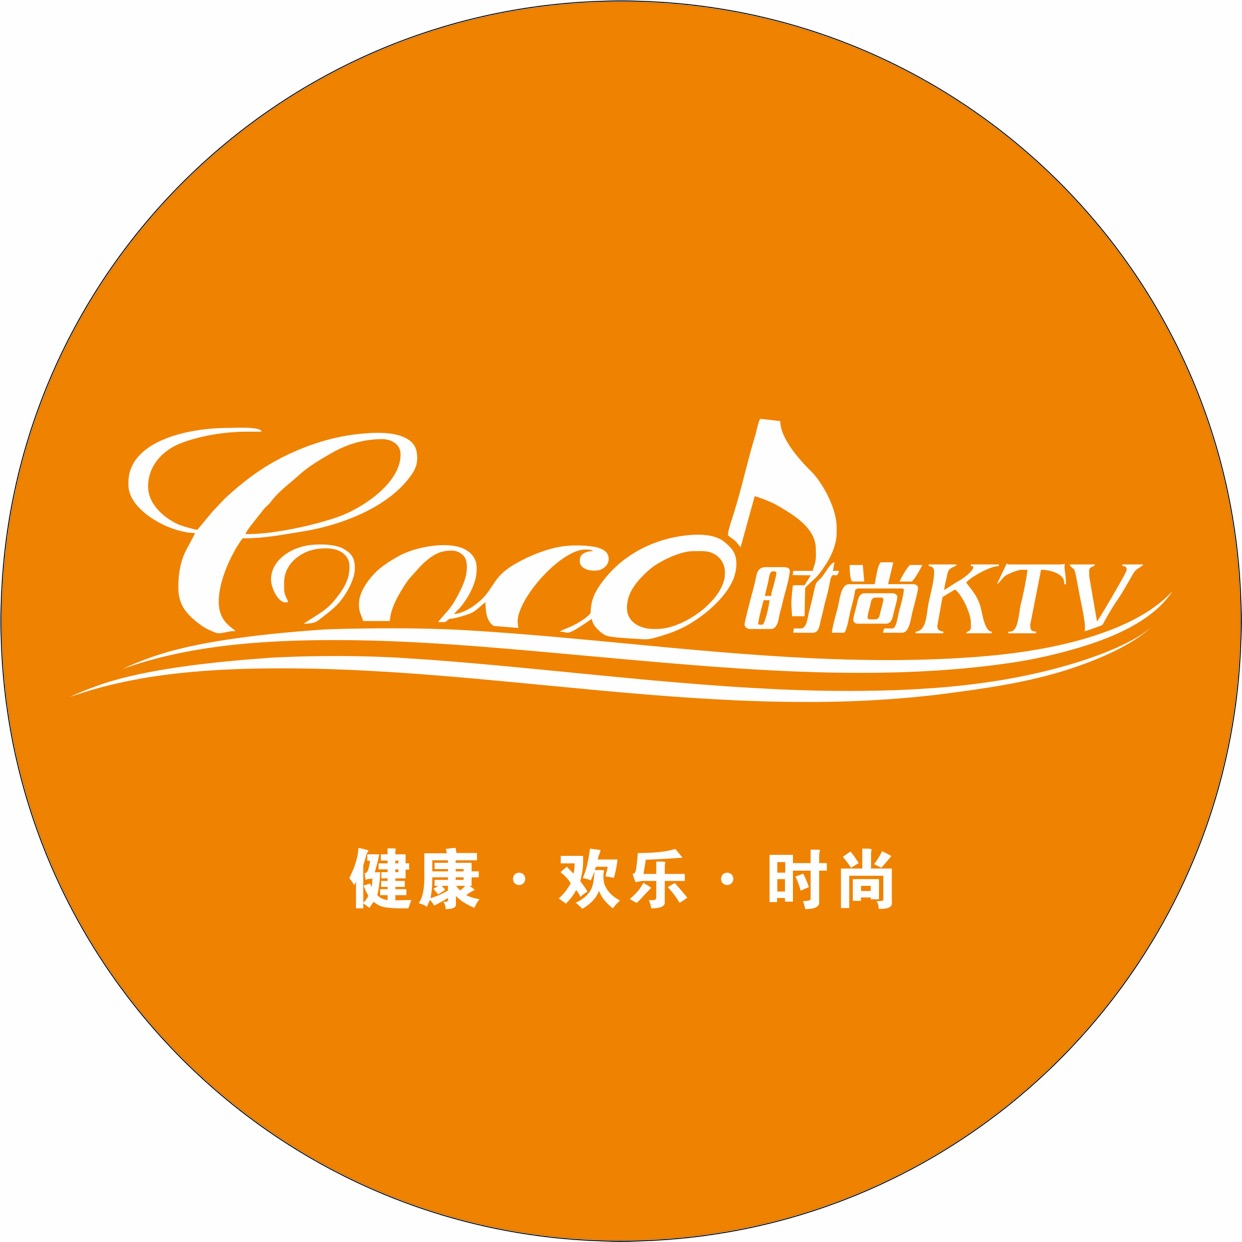 COCO KTV